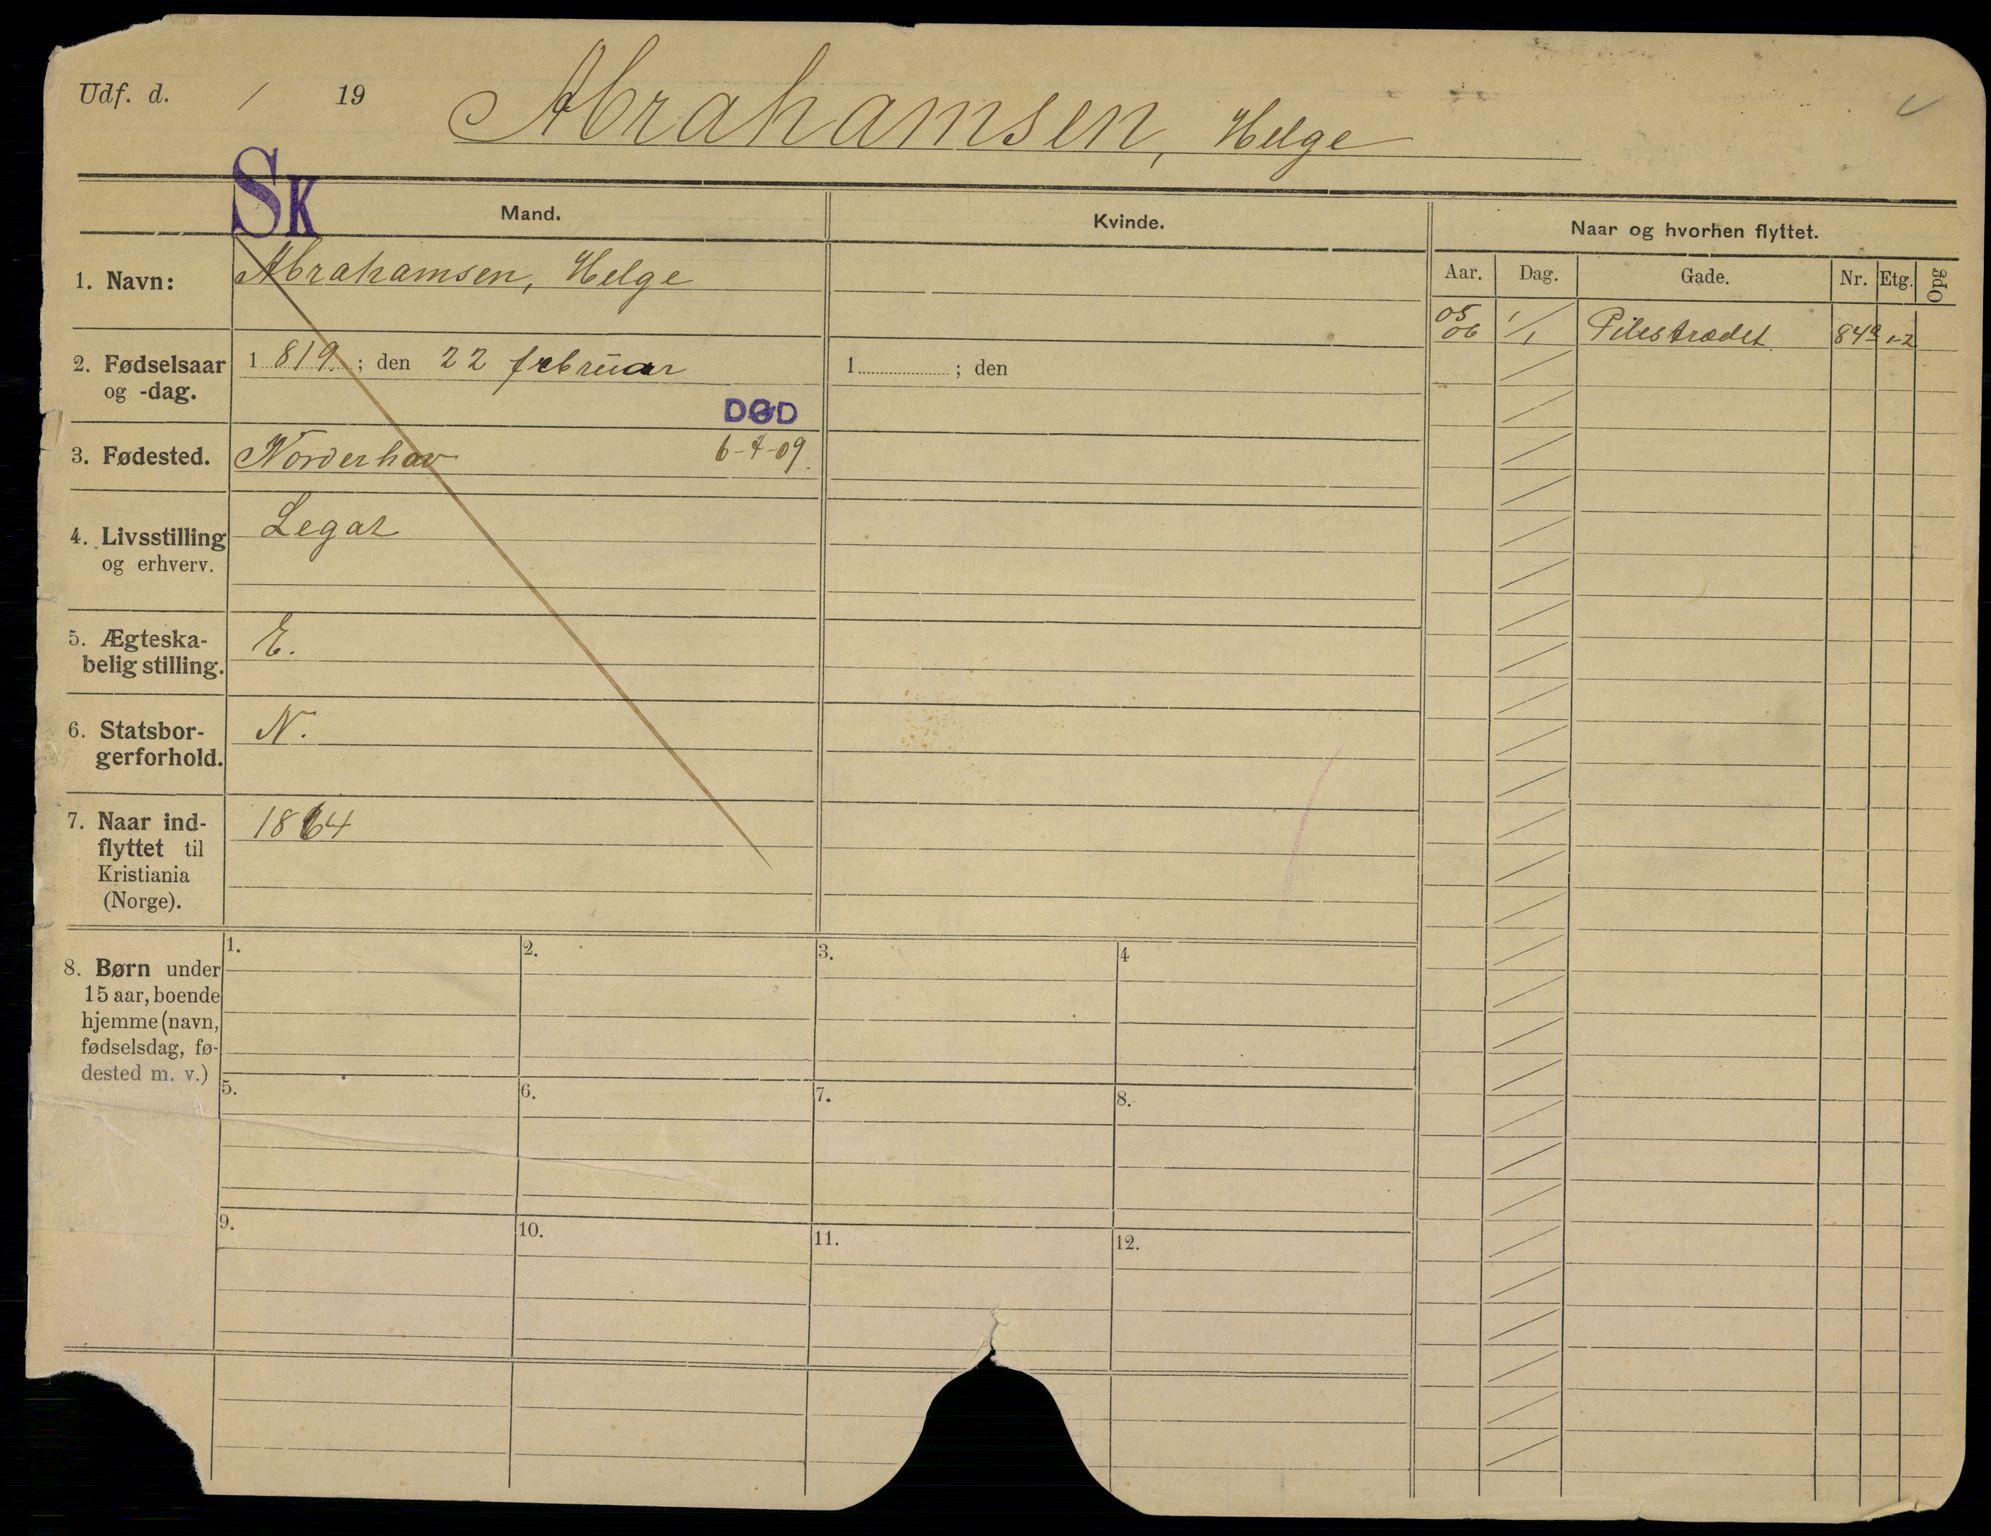 SAO, Oslo folkeregister, Registerkort, G/Gb/L0007: Menn, 1909